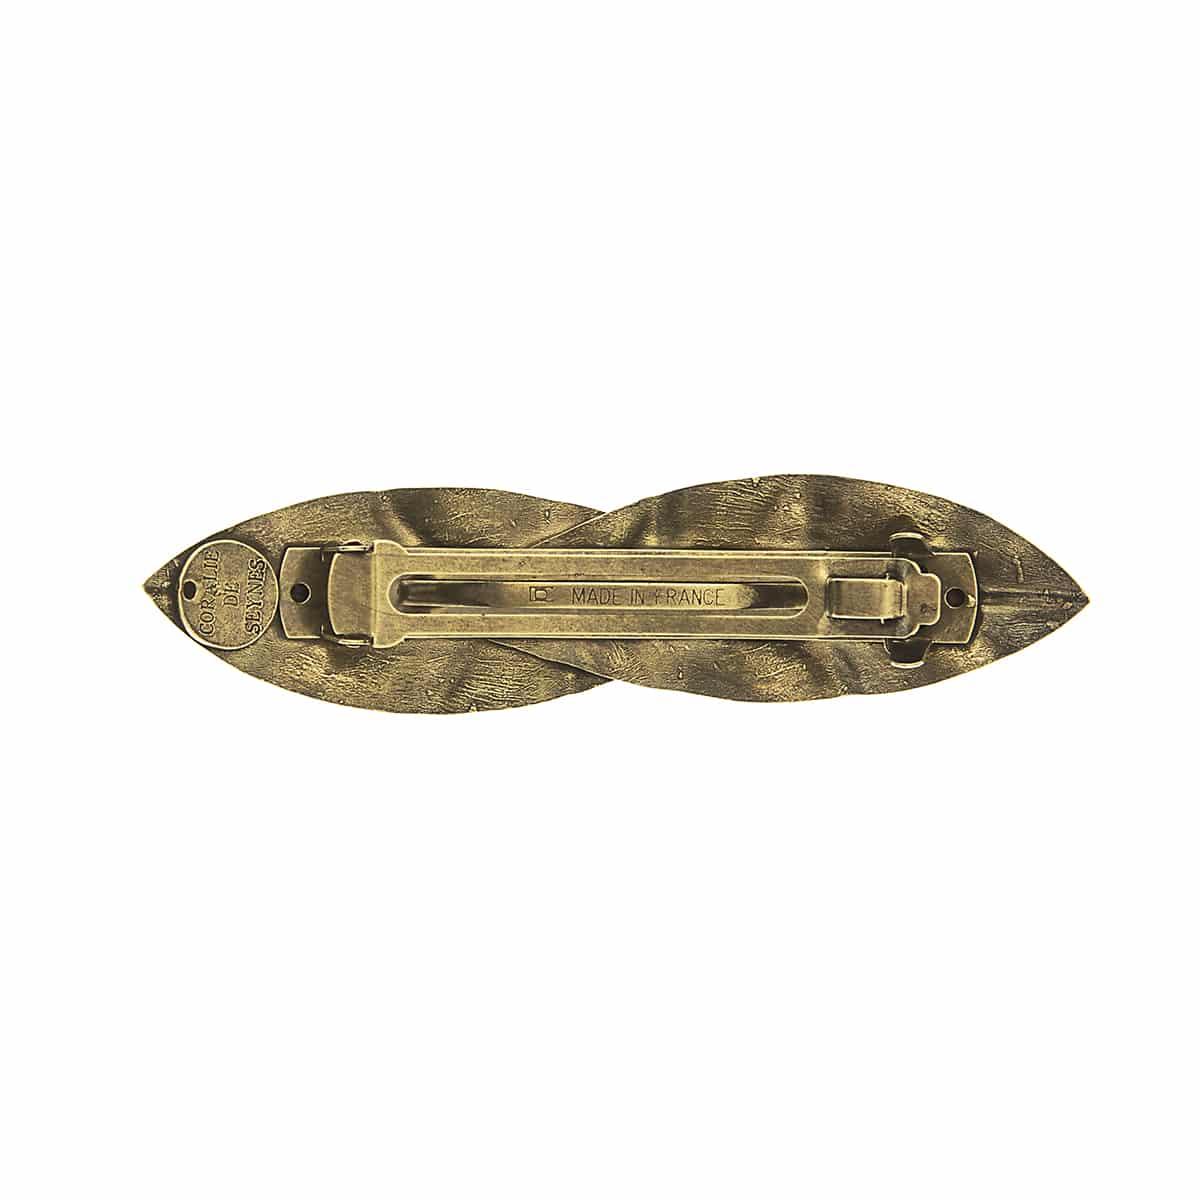 Pinza de latón para el pelo material latón bronce moda complementos pelo mujer coralie de seynes